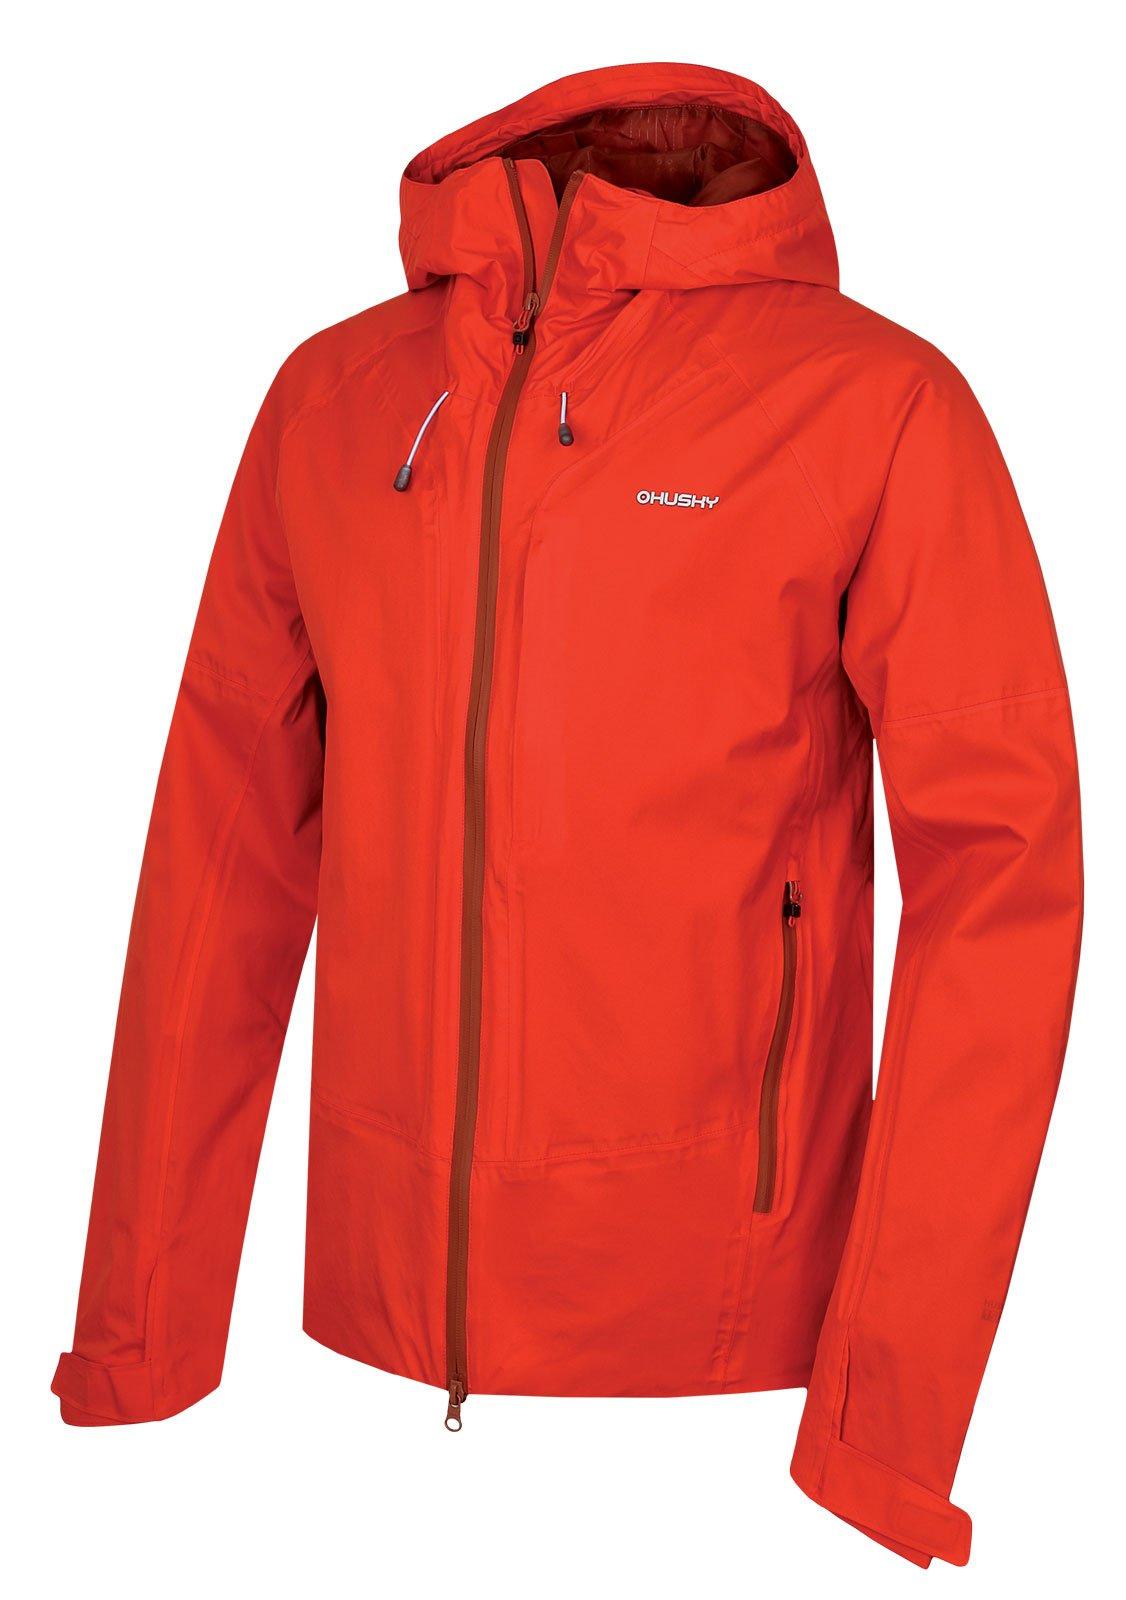 Husky Nicker M červená, XL Pánska hardshellová bunda